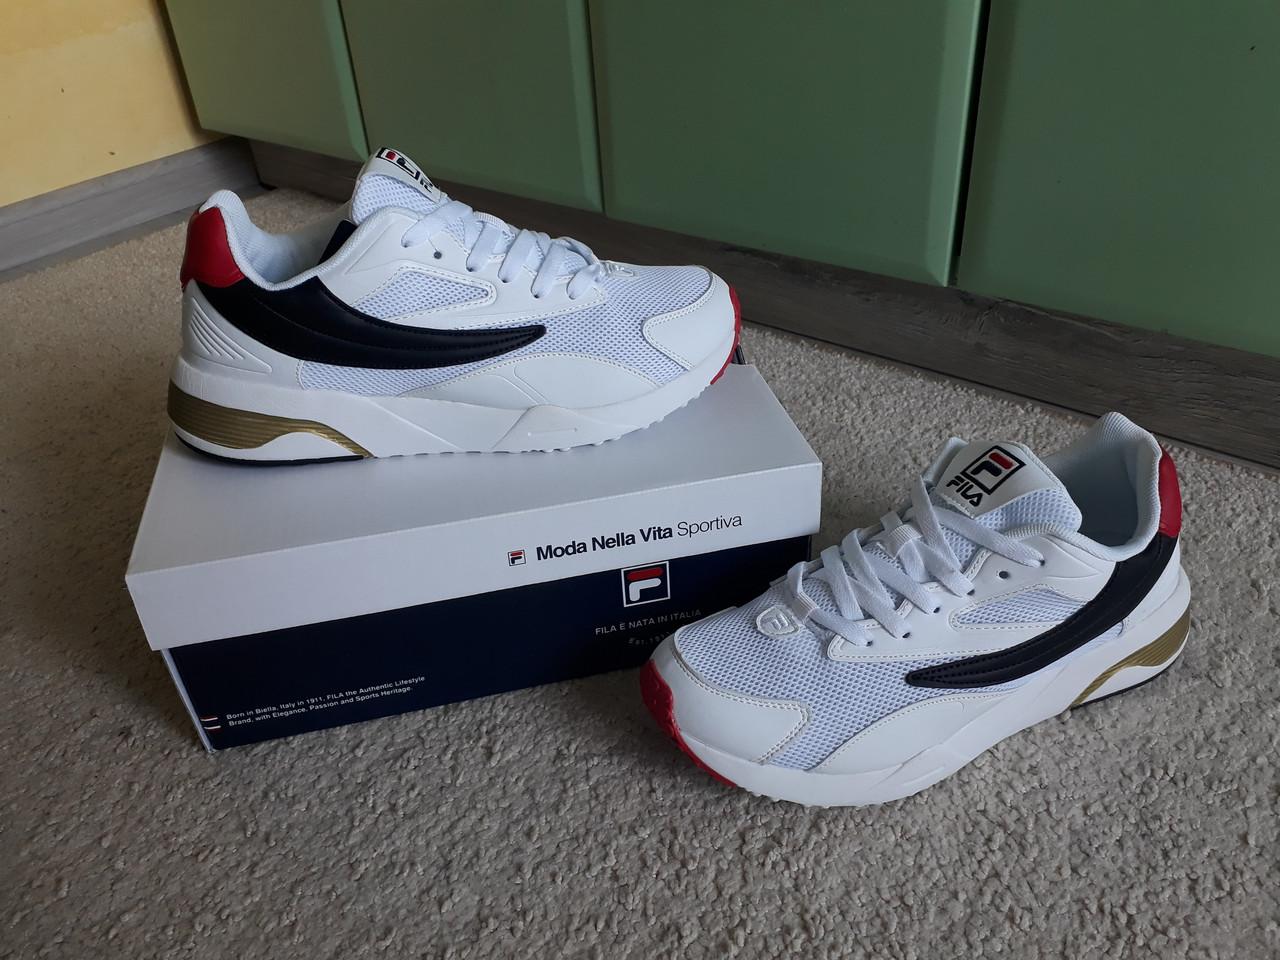 1ddd90533de Мужские кроссовки Fila Venom v2 2019 White белые эксклюзив - sinitsa shop -  интернет-магазин обуви